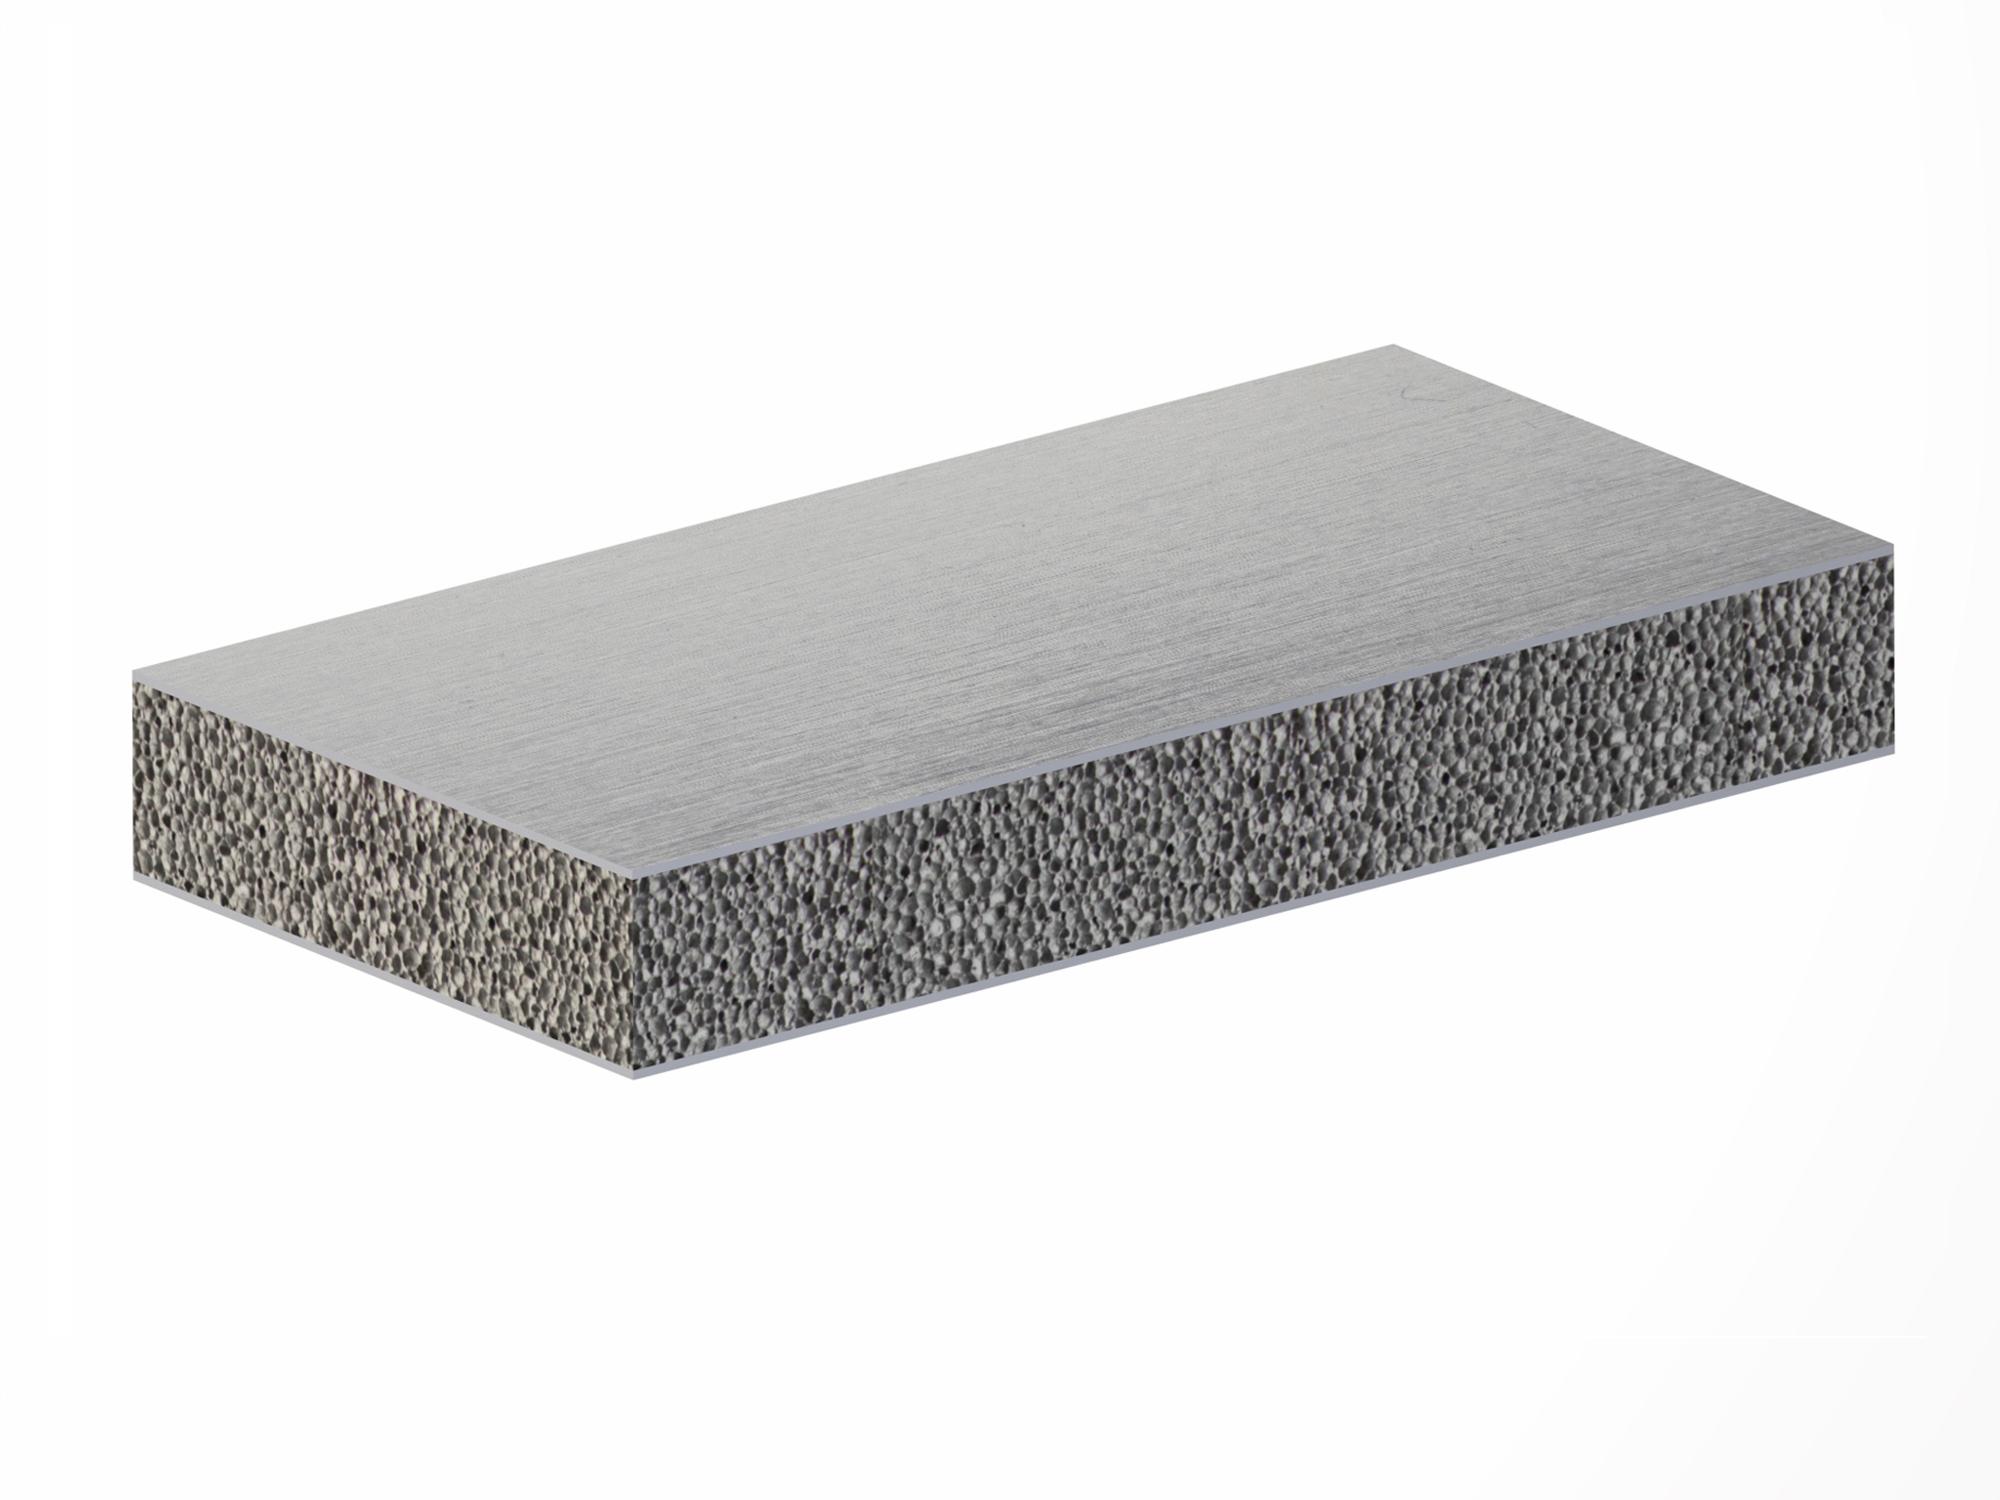 Stavatti, Aluminum Foam Metal Sandwich, Foam Metal Sandwich, Aluminum Foam, Metal Foam, Foam Metal